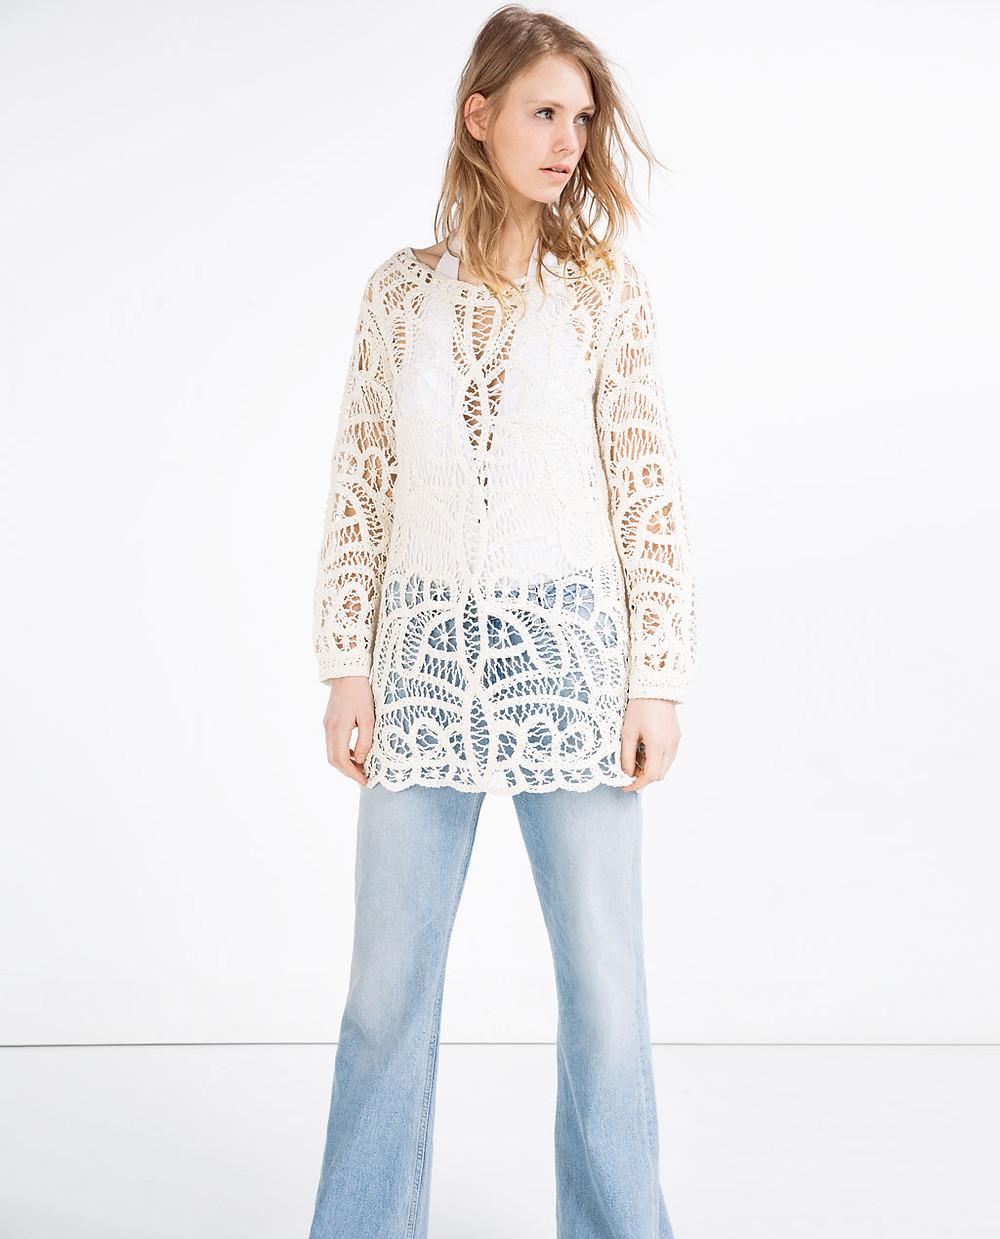 Zara macramé dress with flared sleeves now $39.99